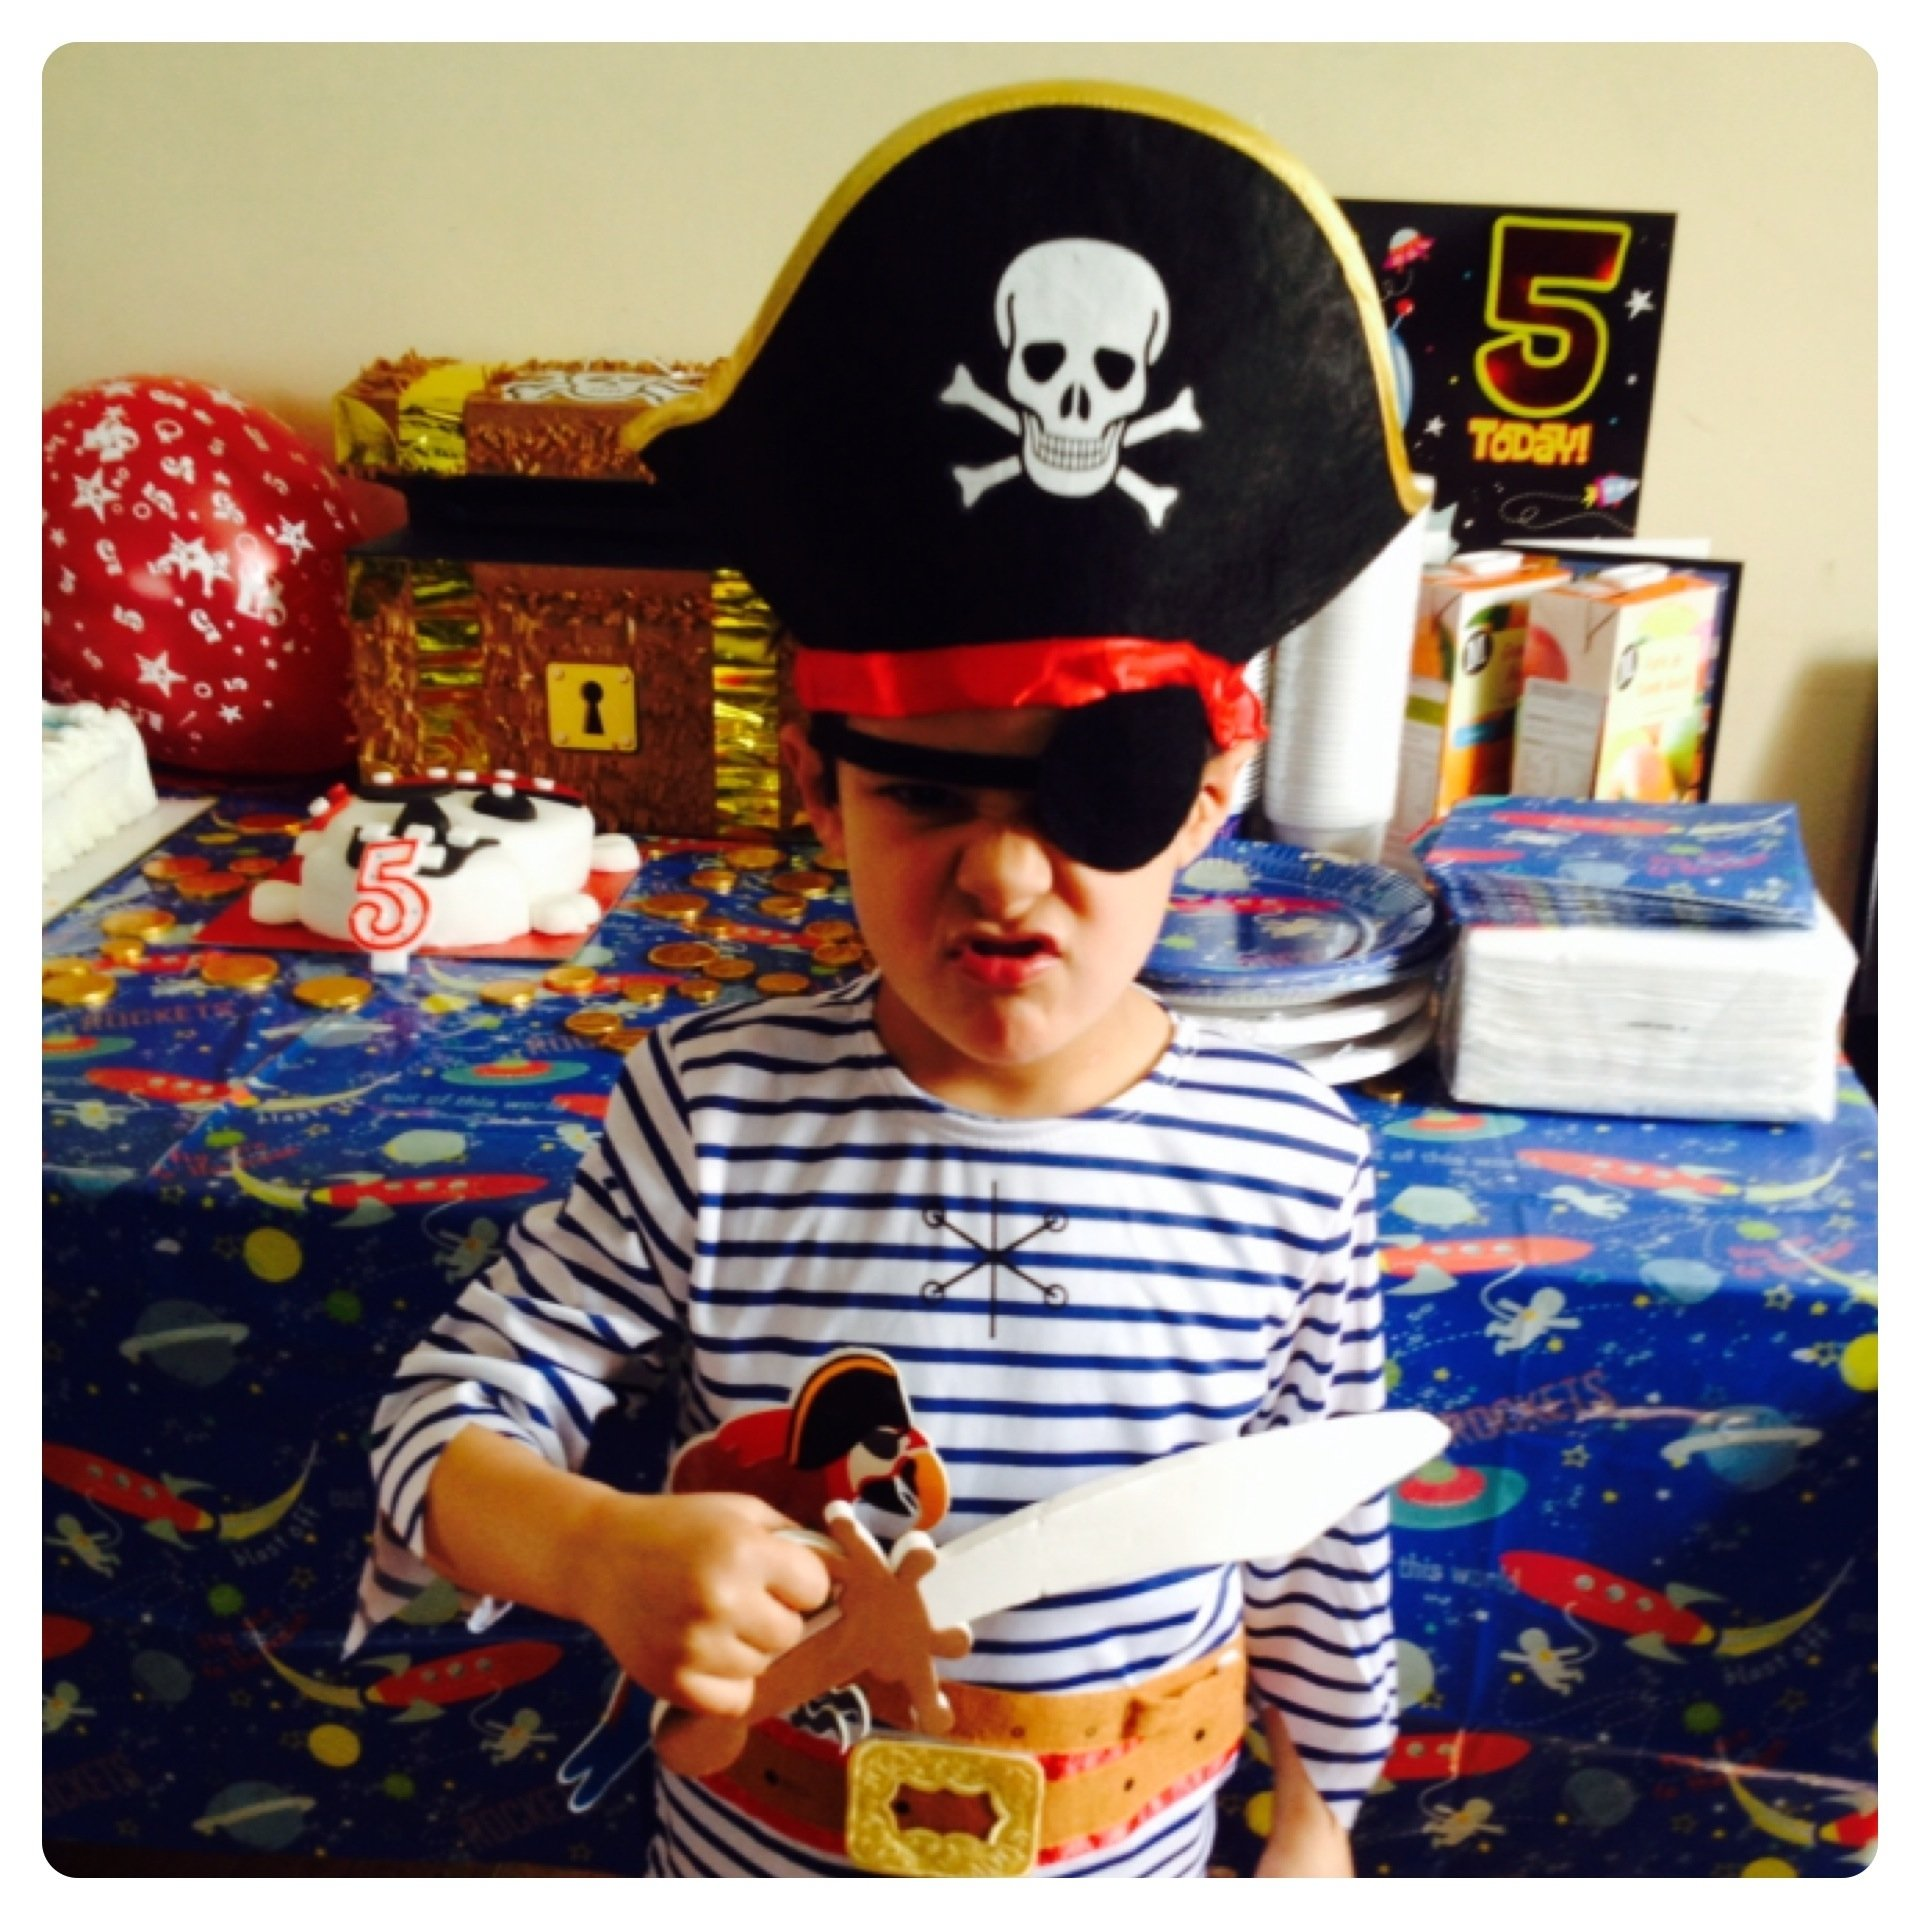 10 Amazing 5Th Birthday Party Ideas For Boys 5th birthday party ideas boys pirate party decorations and 1 2020